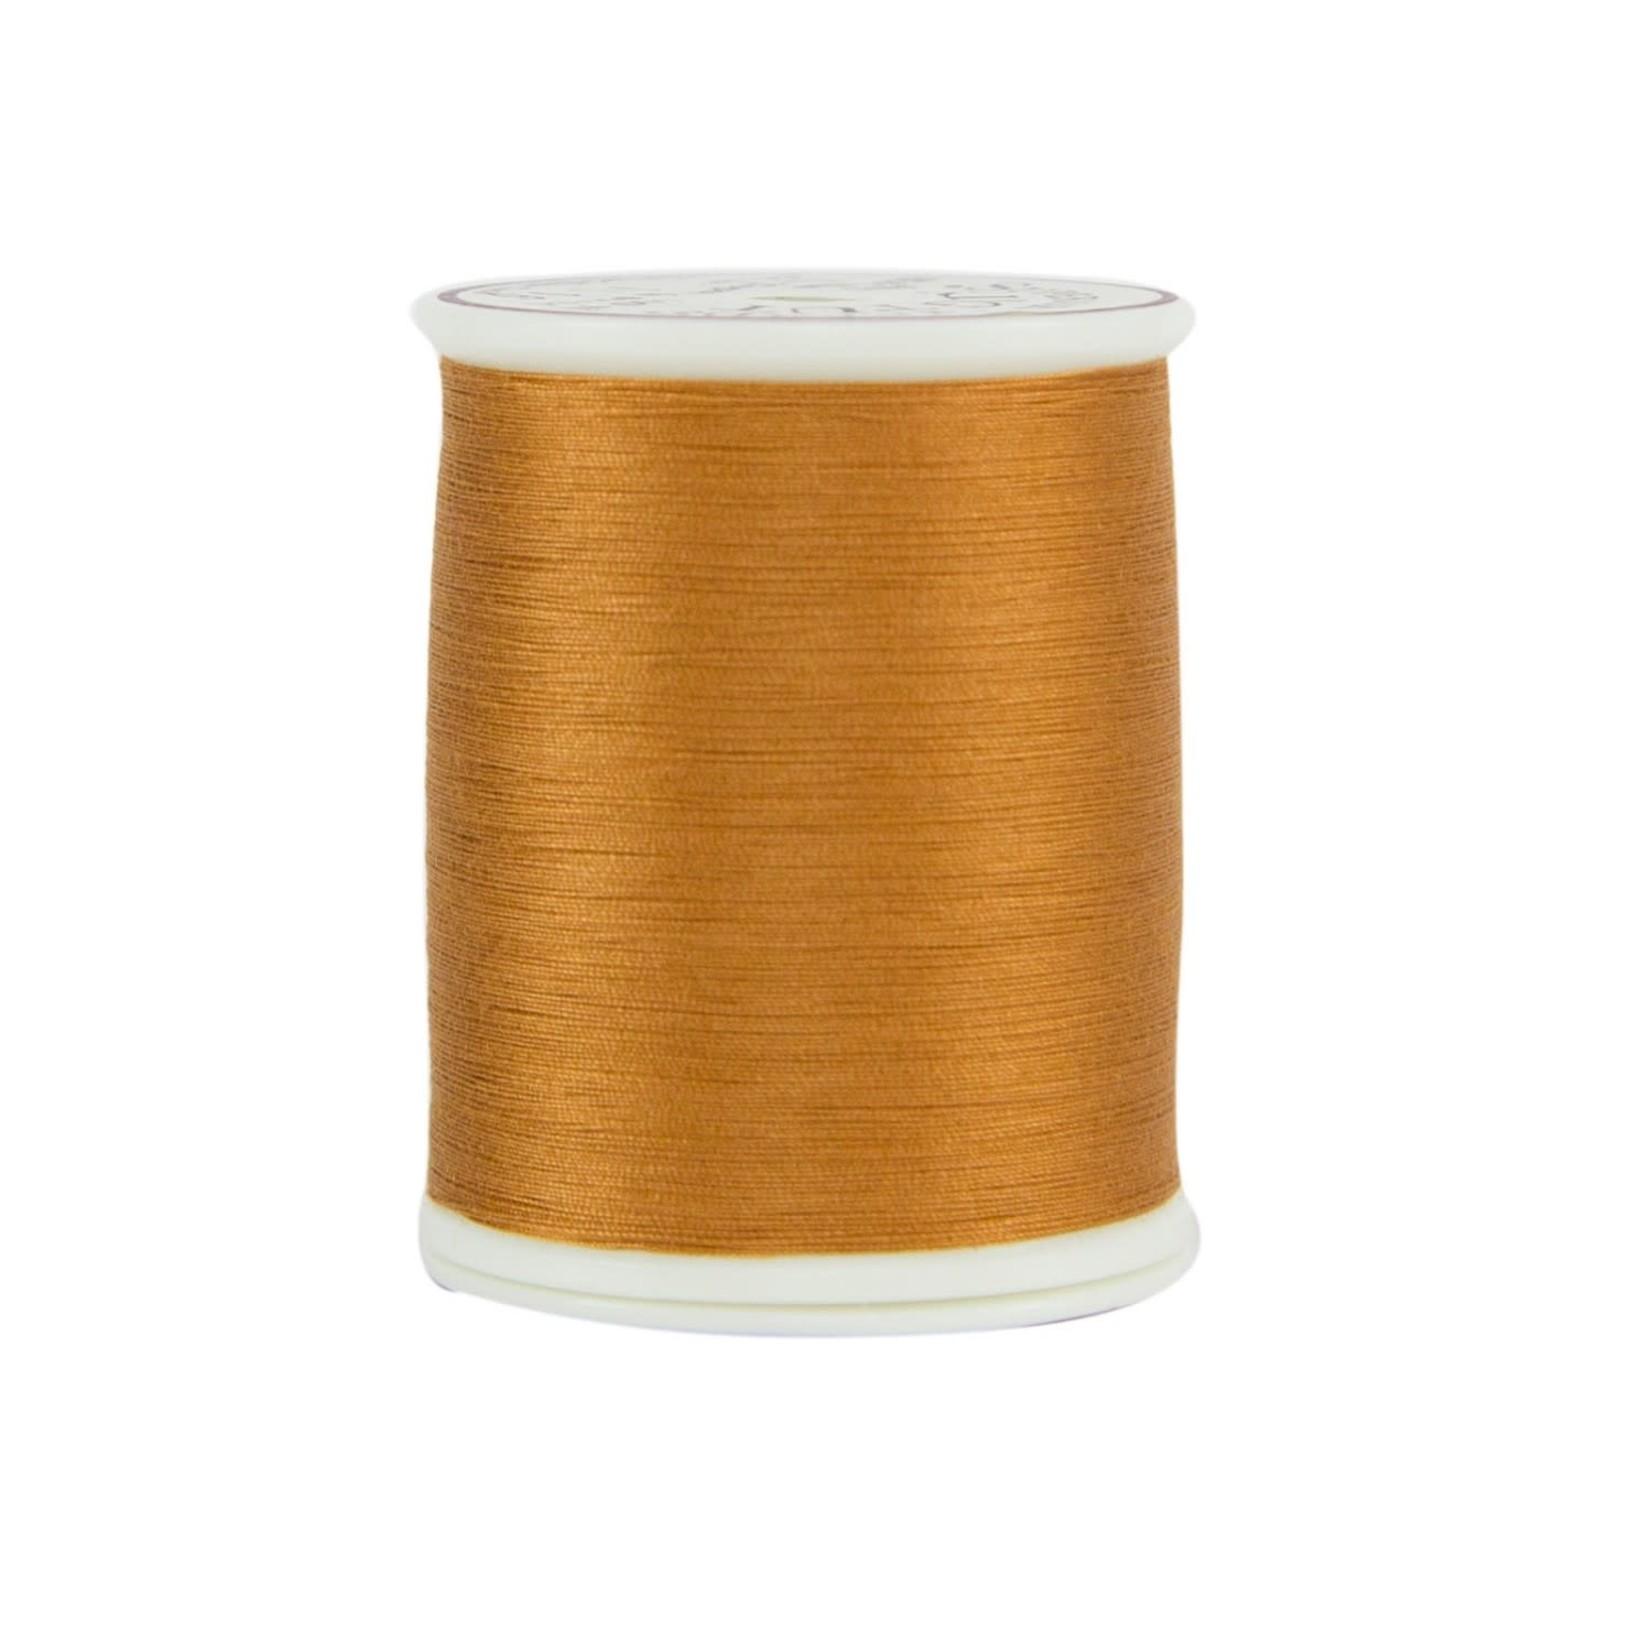 Superior Threads King Tut - #40 - 457 m - 1016 Cinnamon